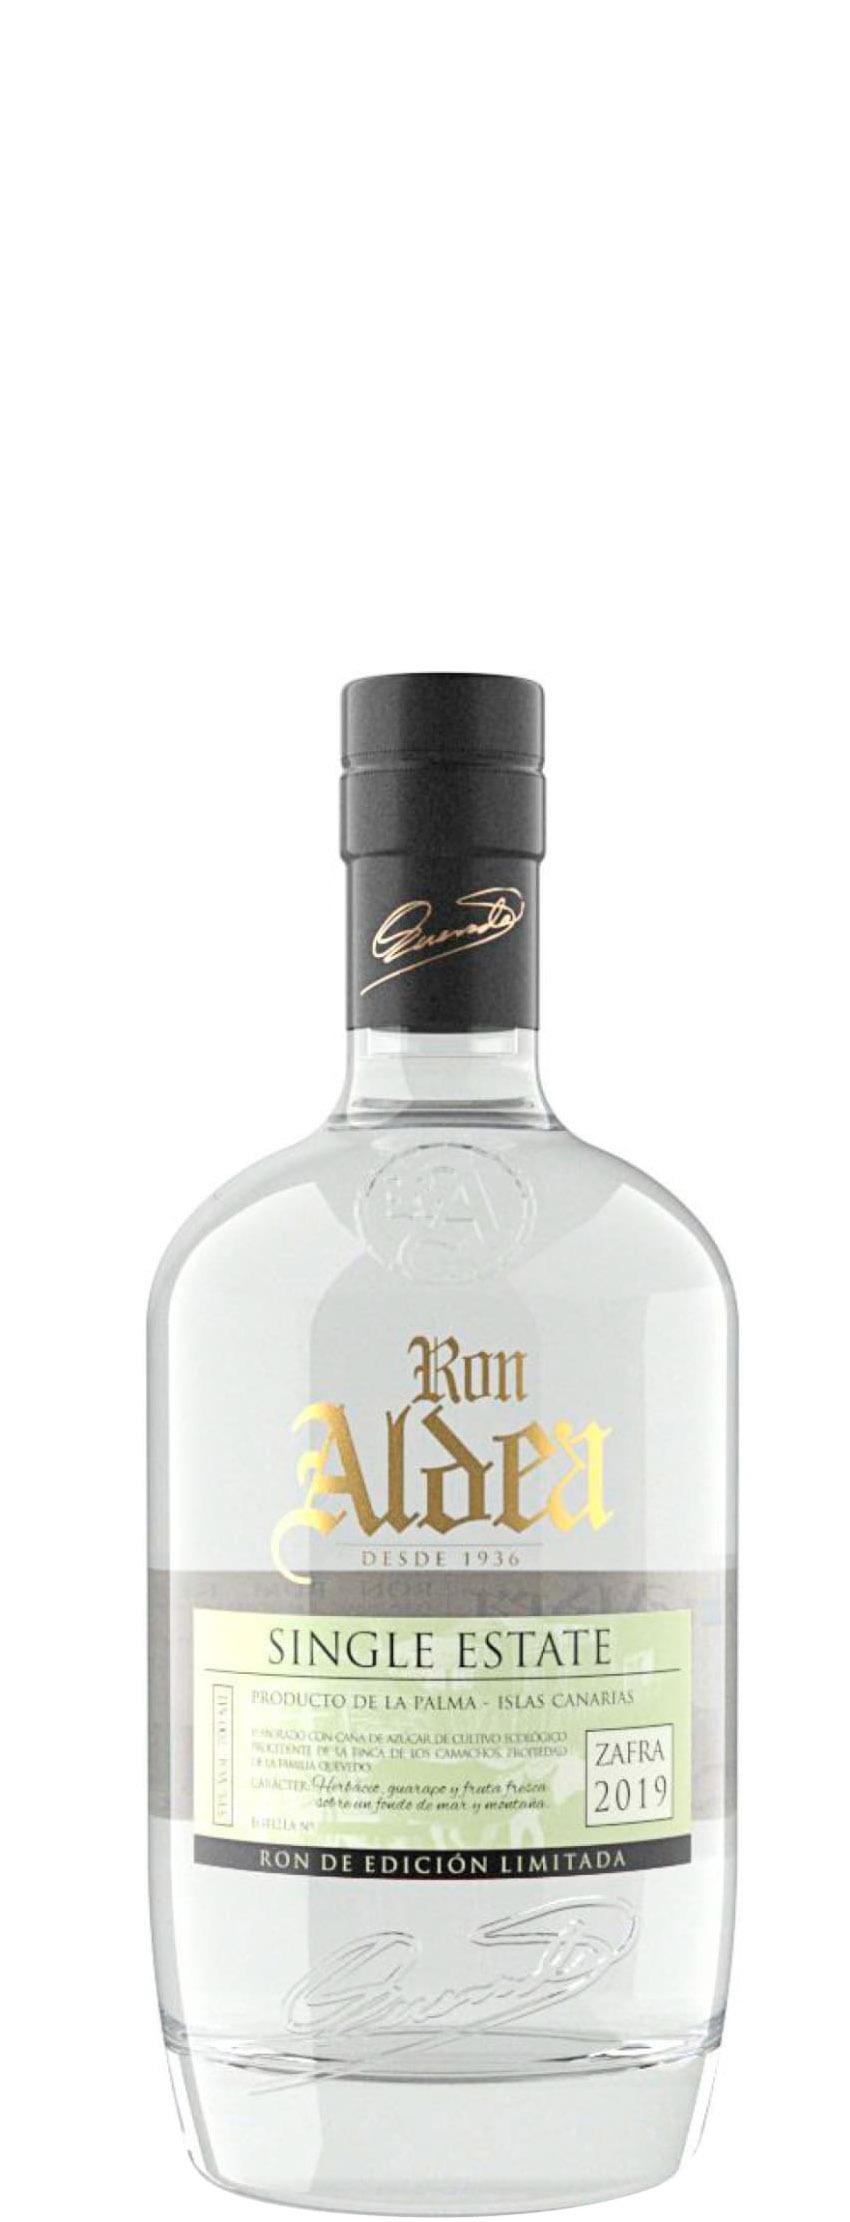 Ron Aldea Single Estate Eco Rhum 2019